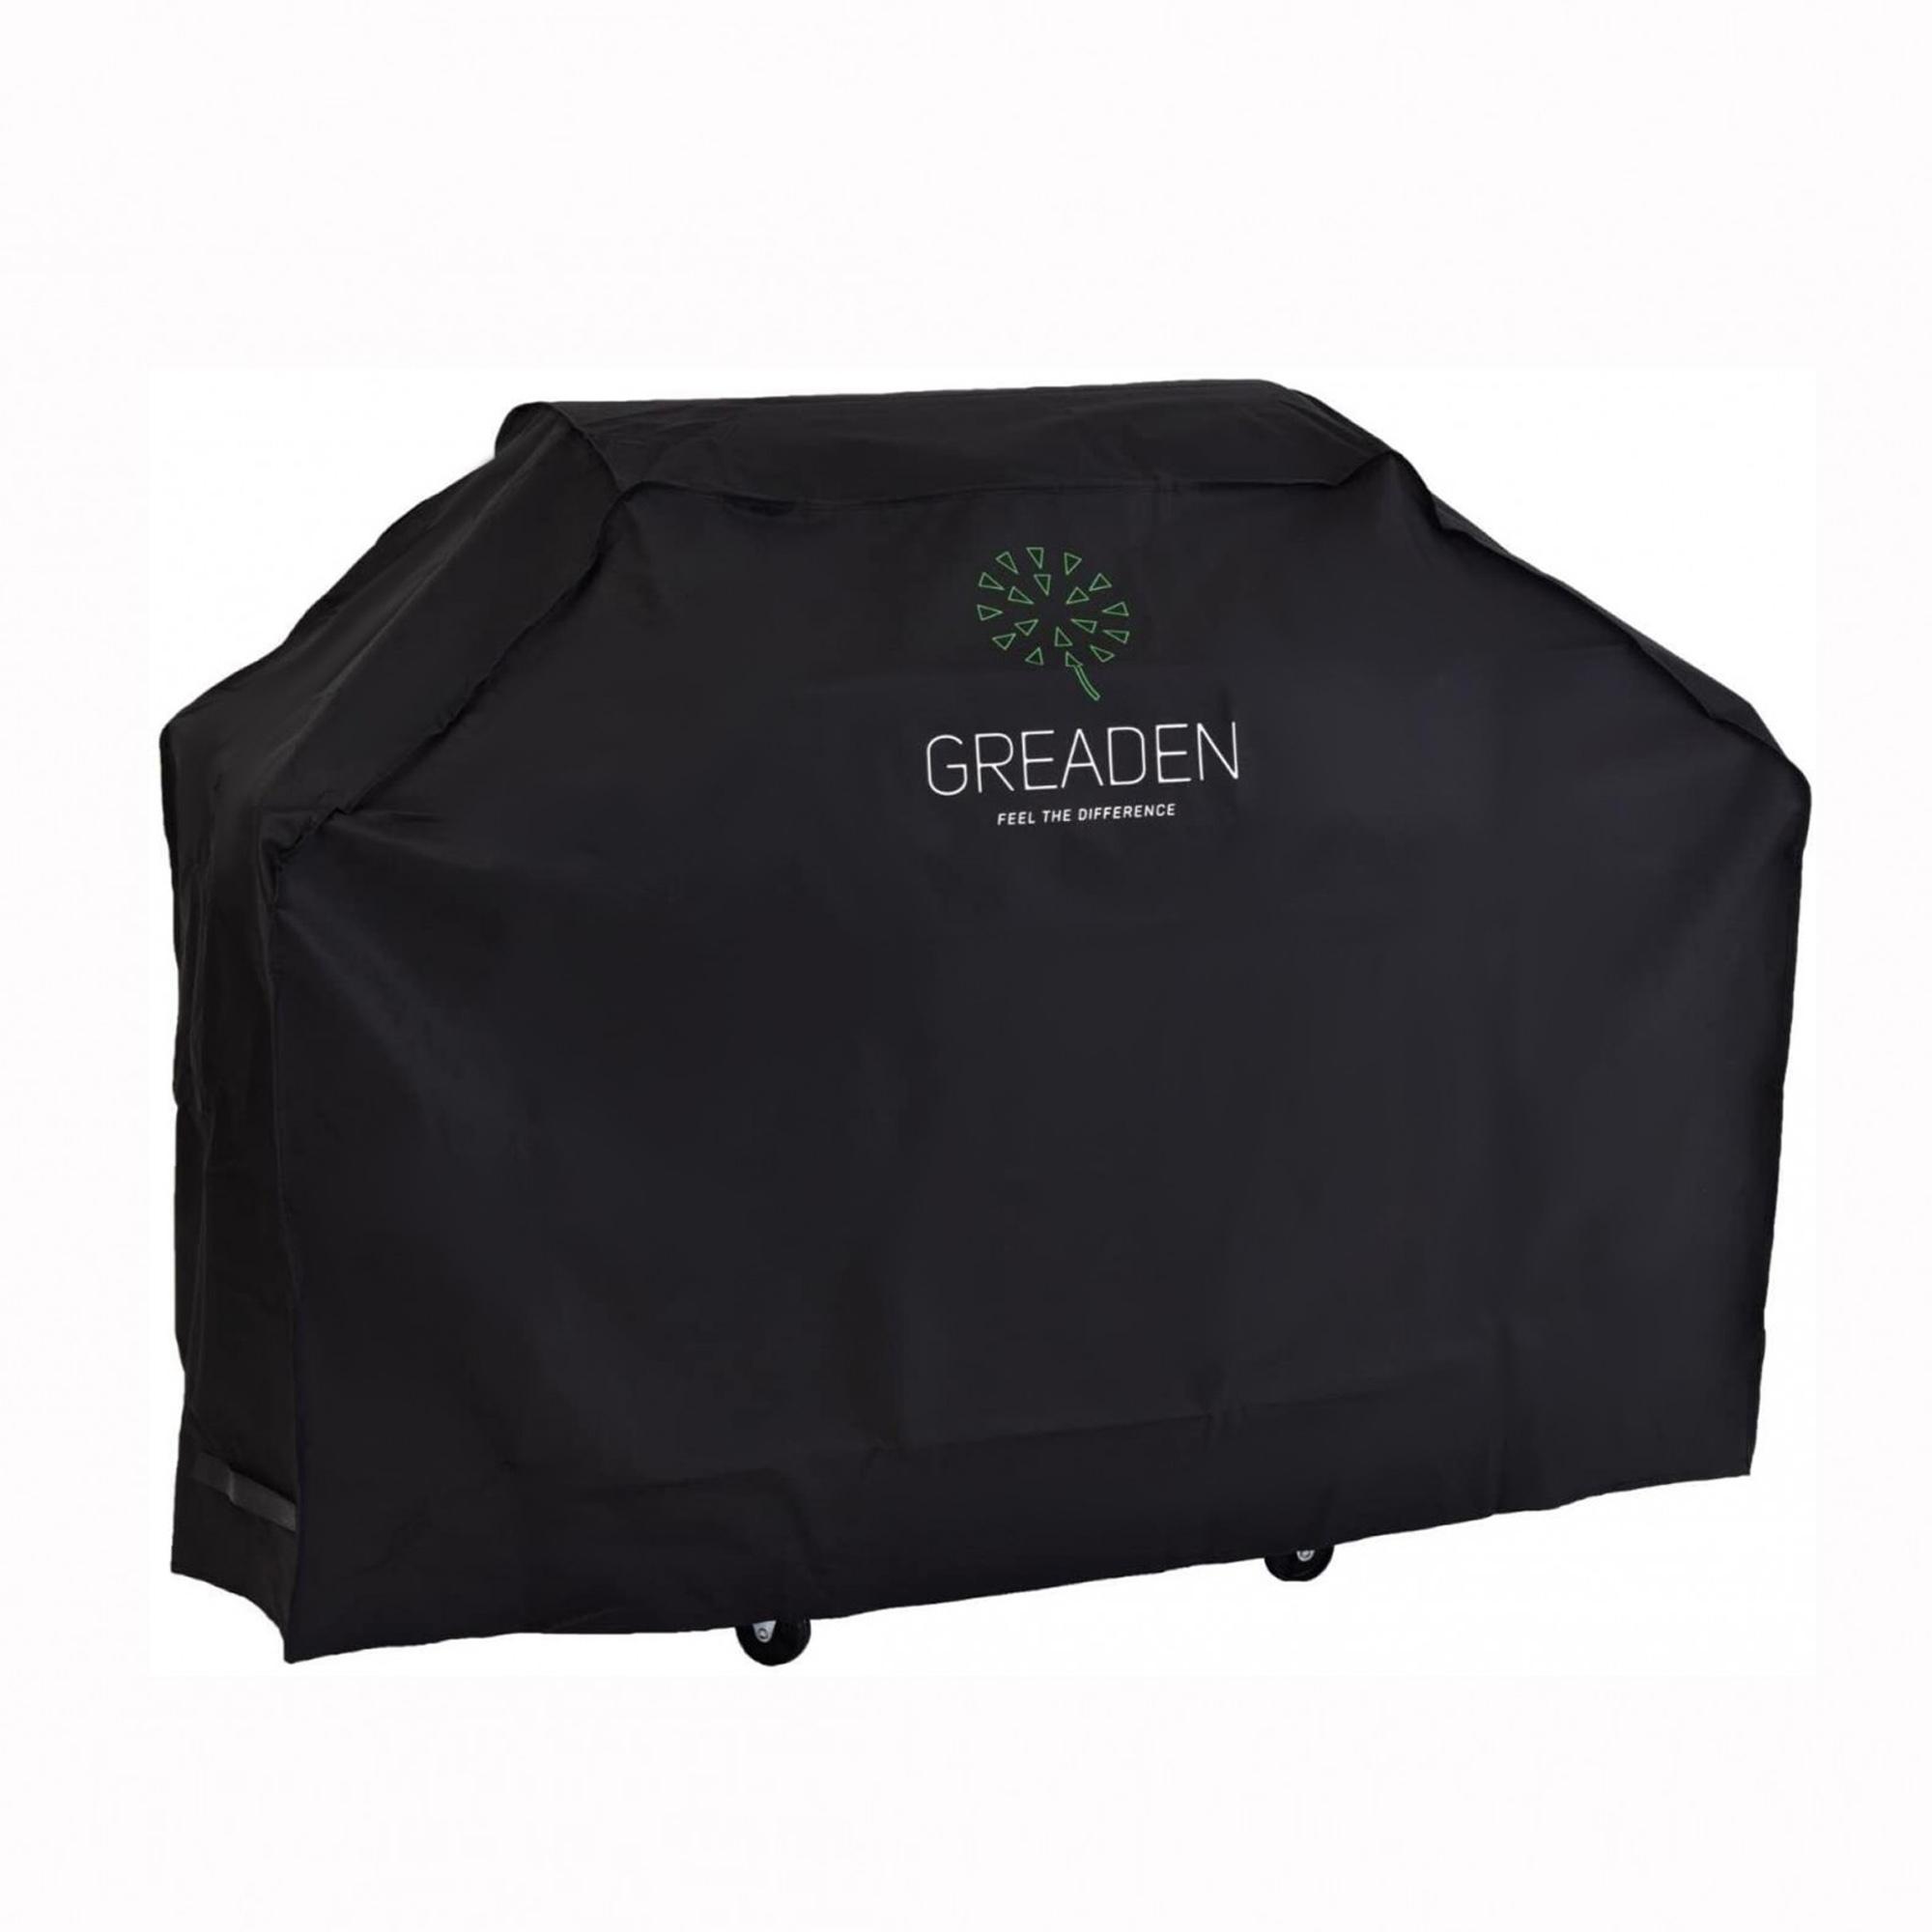 Housse de protection pour barbecues en polyester